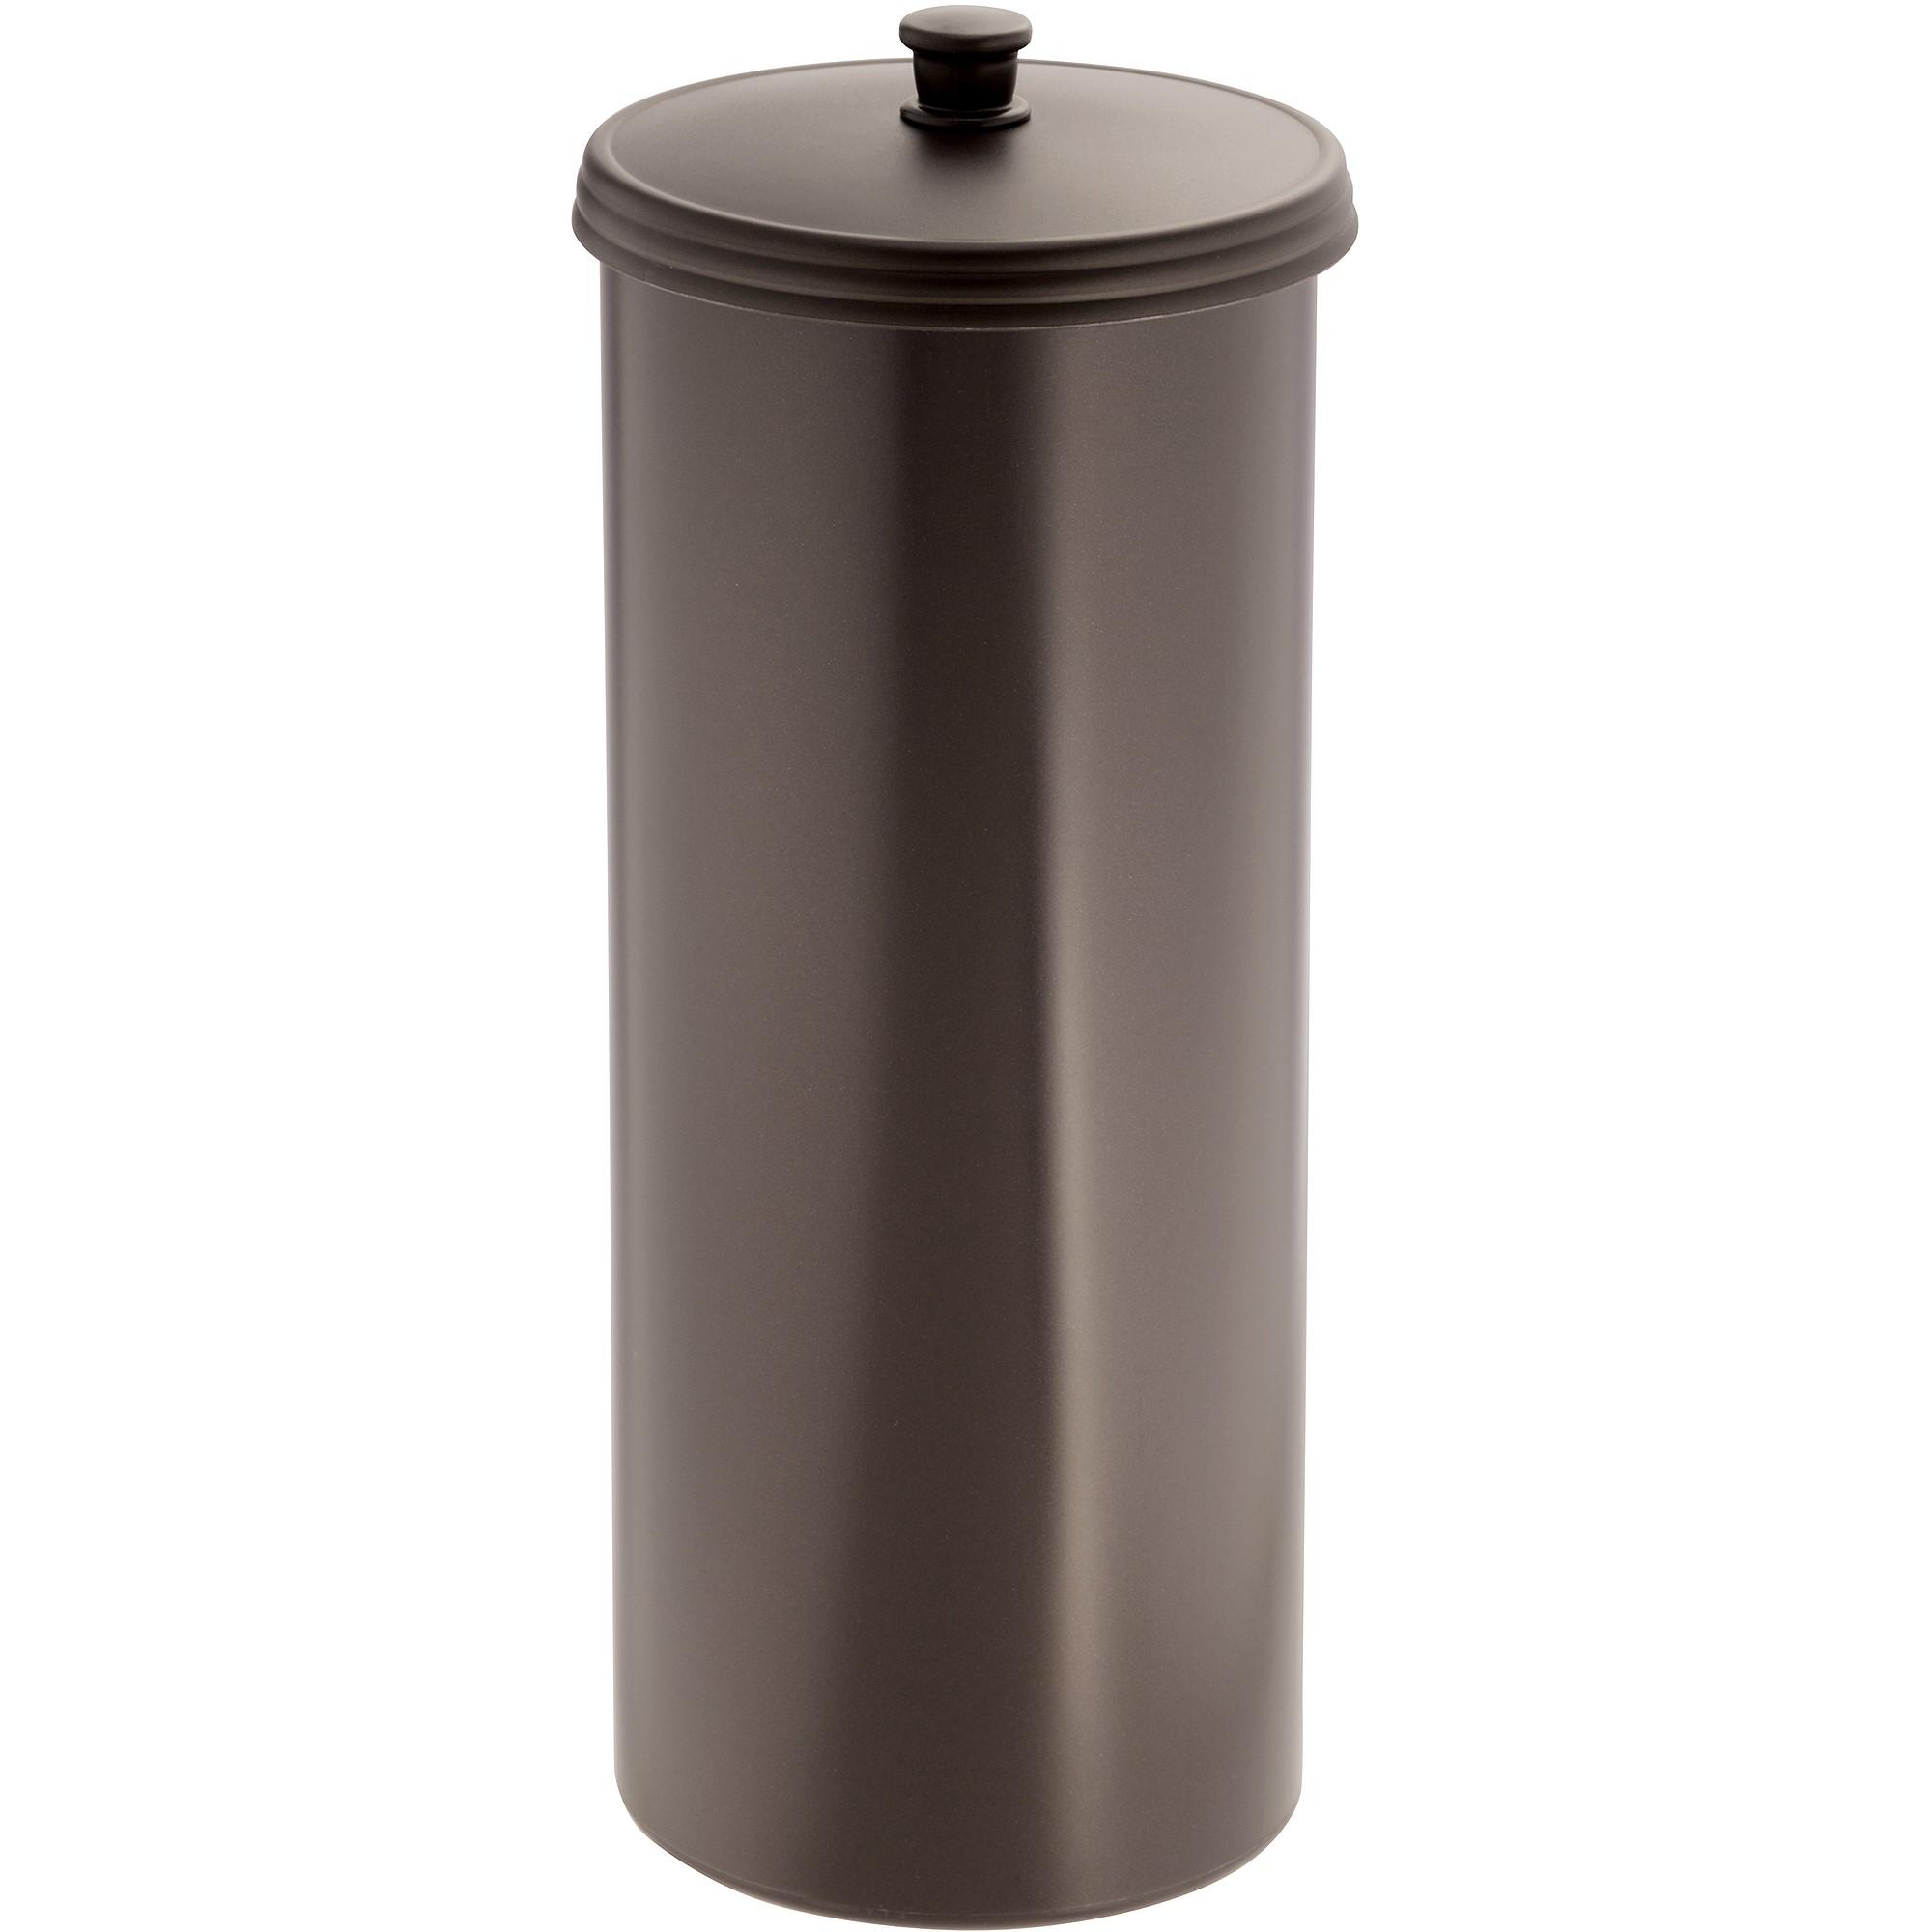 InterDesign Kent Bathware, Free Standing Toilet Paper Roll Holder for Bathroom Storage, Bronze